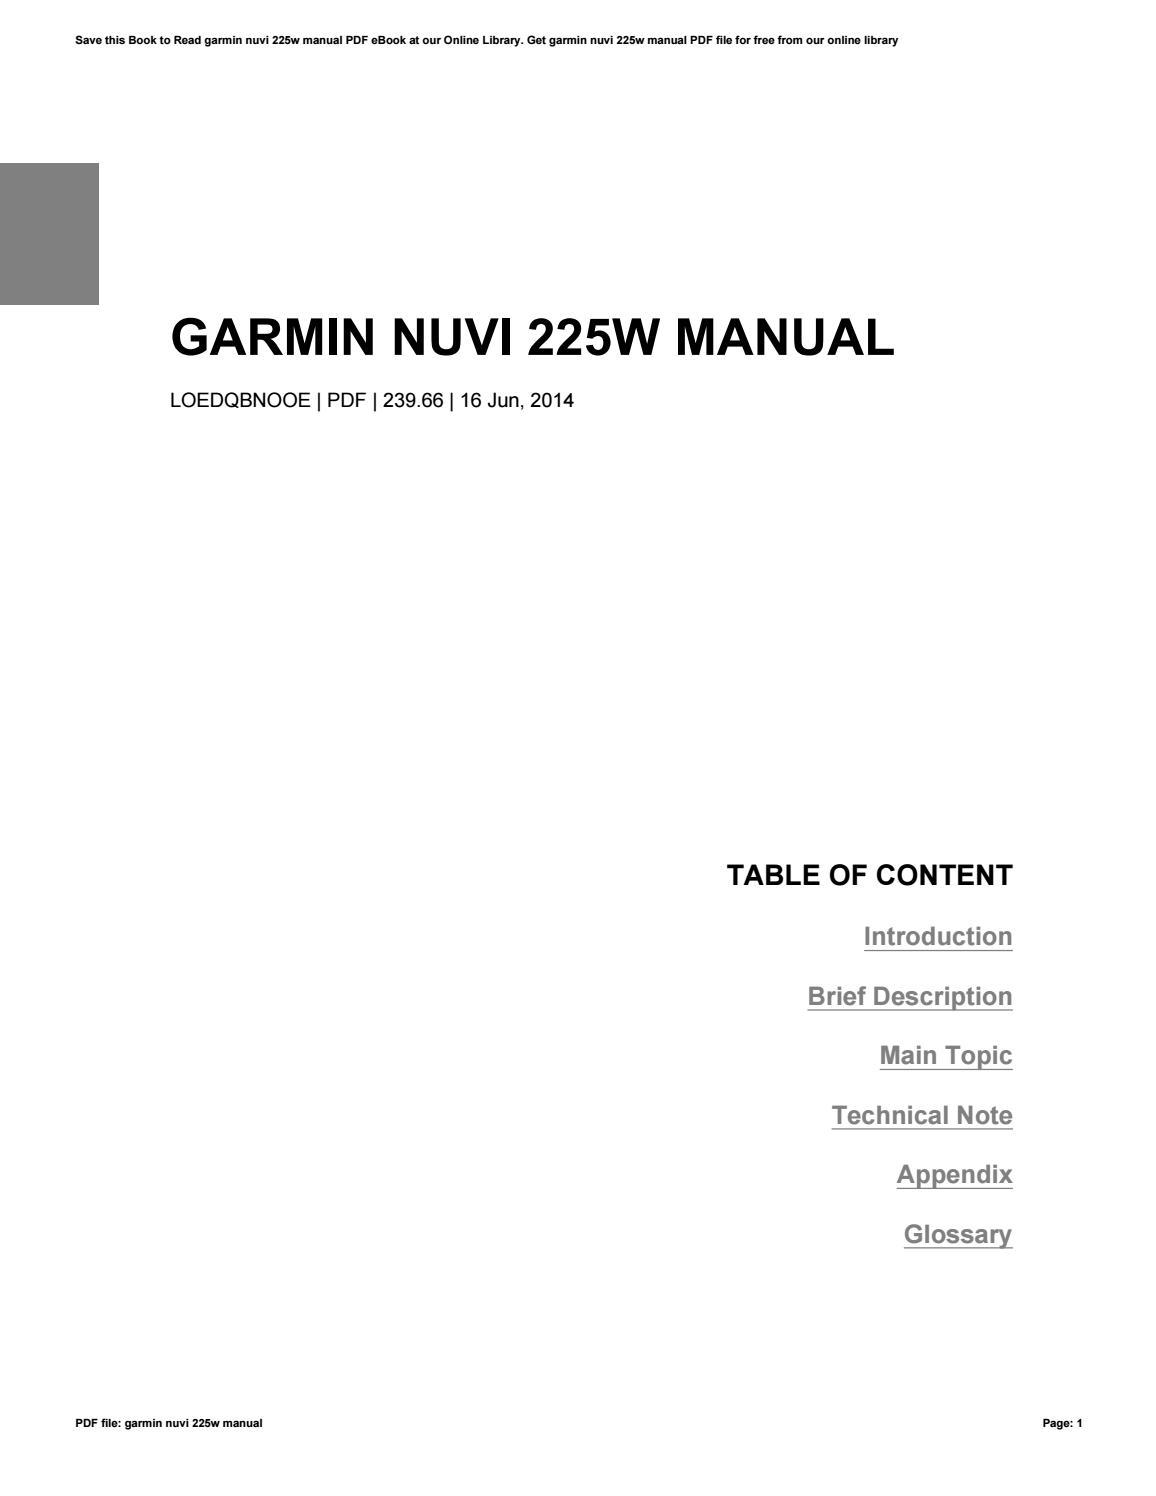 Image Result For Garmin Nuvi